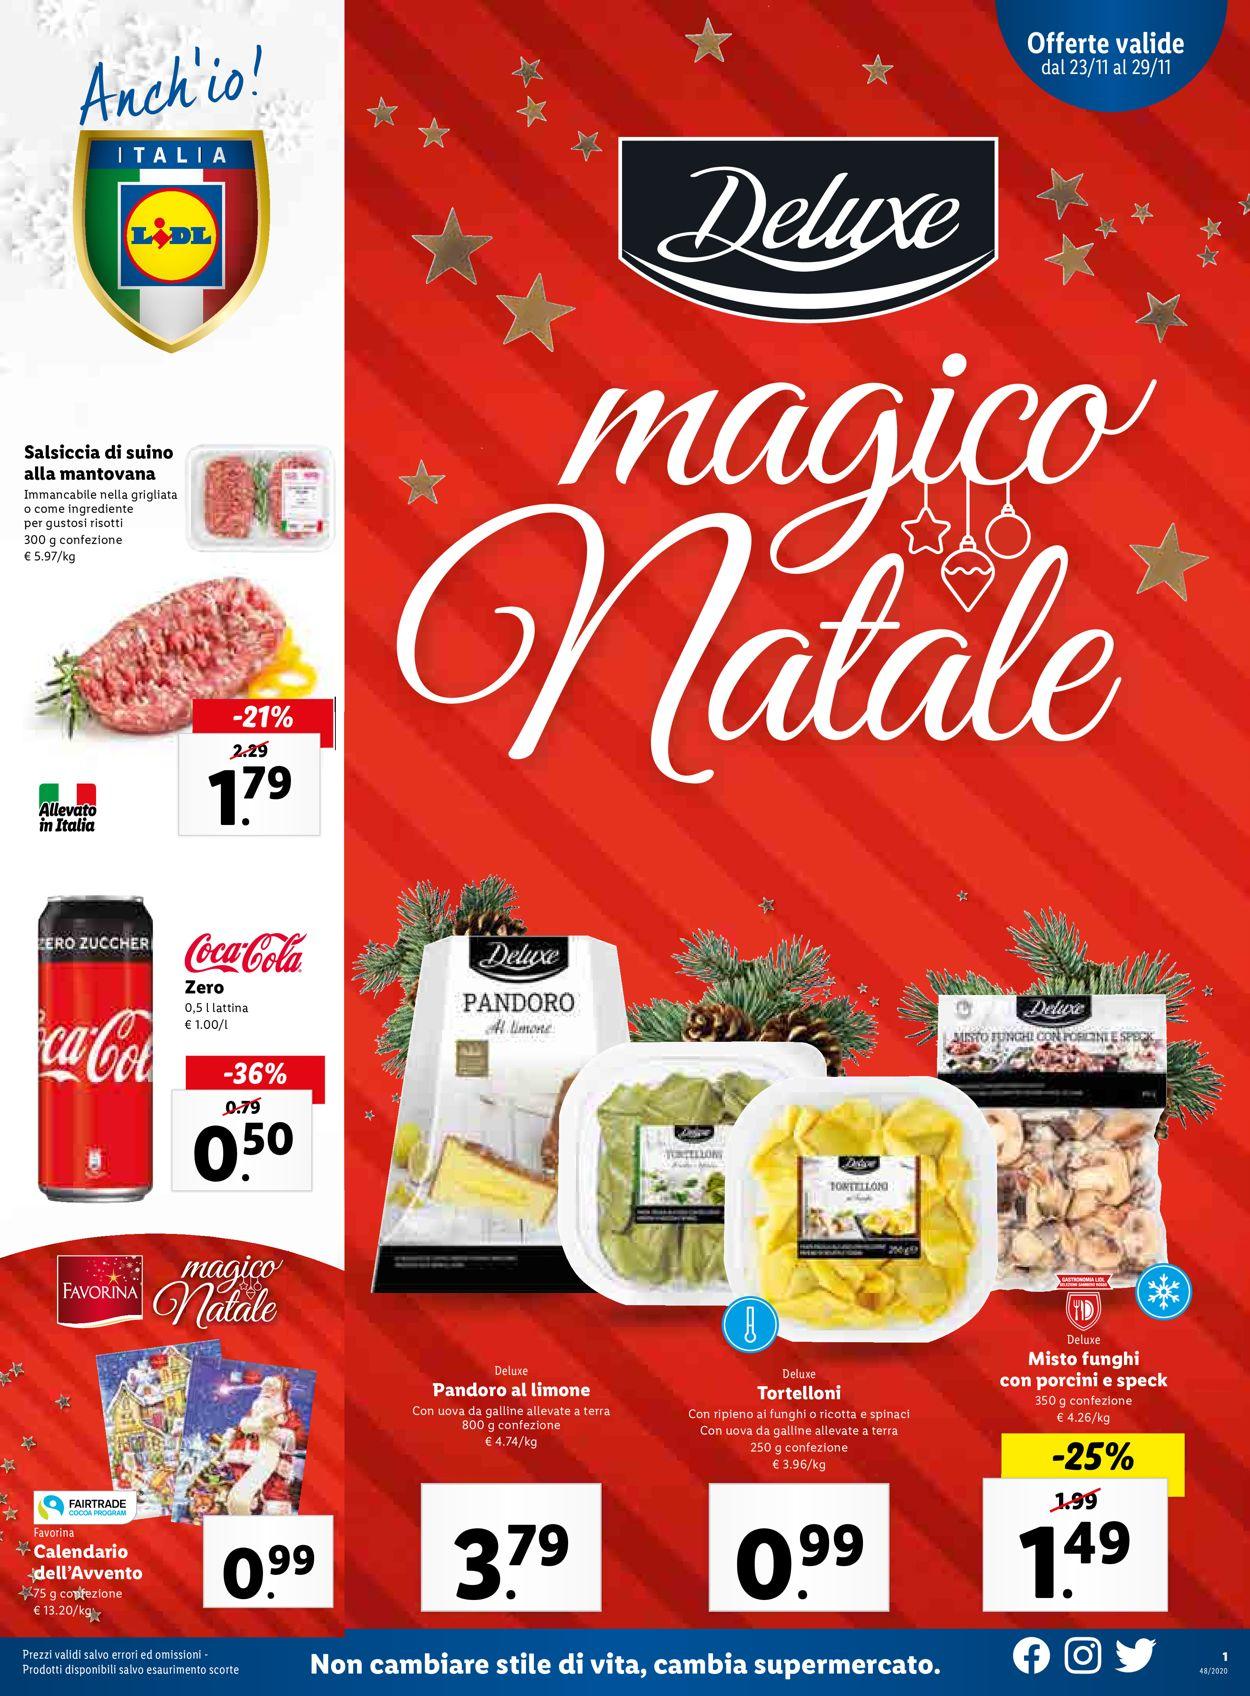 Volantino Lidl - Natale 2020 - Offerte 23/11-29/11/2020